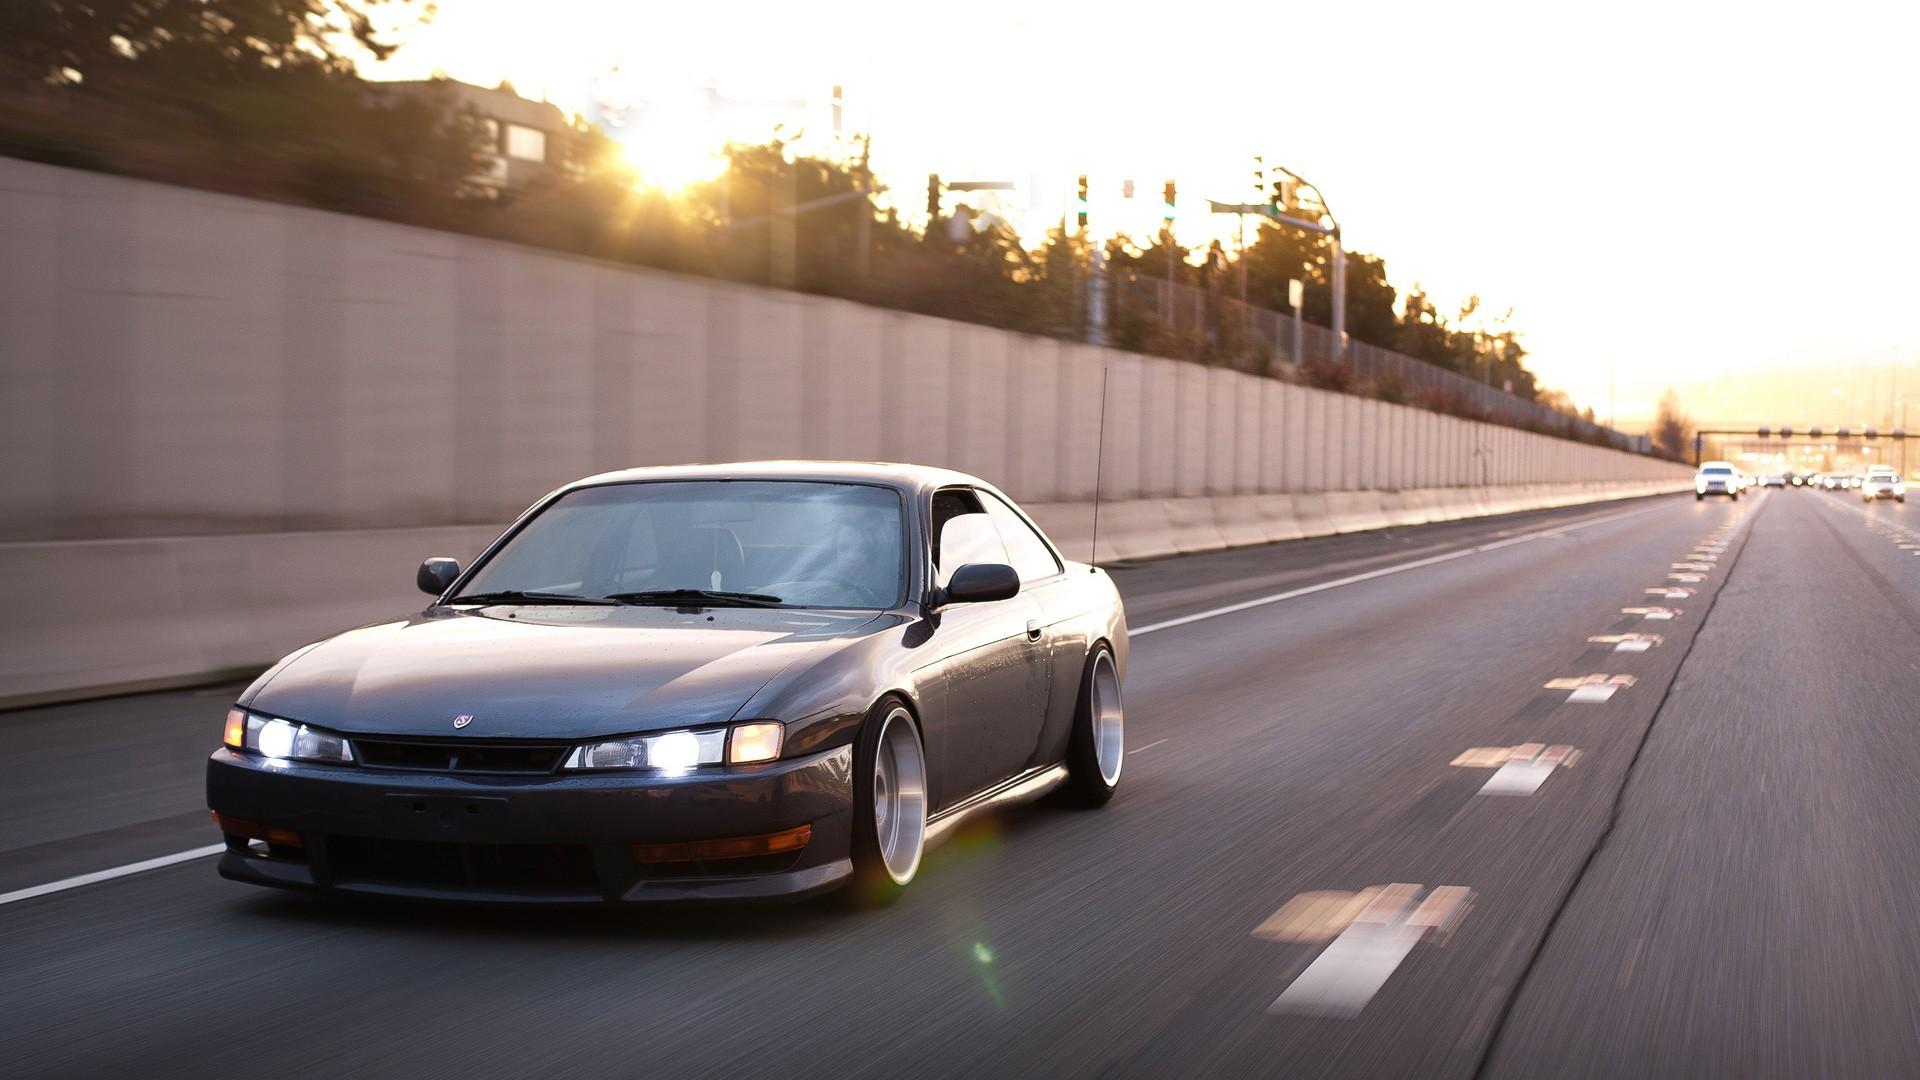 Hd Jdm Car Wallpapers Nissan Silvia S14 Kouki Car Jdm Tuning Wallpapers Hd